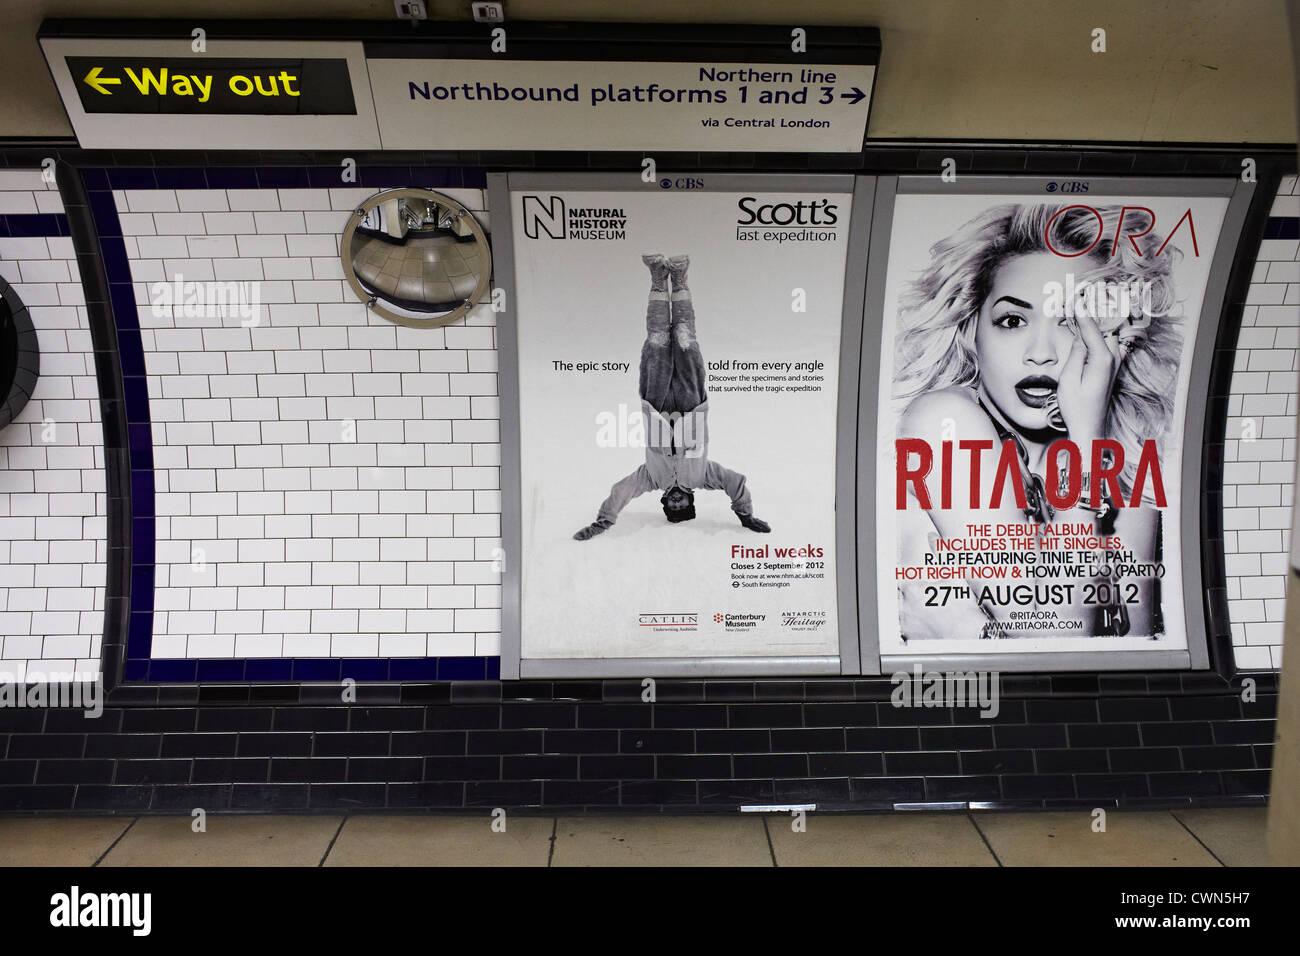 Adshel - Advertising hoardings and back-lit poster and design on the street of London UK. - Stock Image